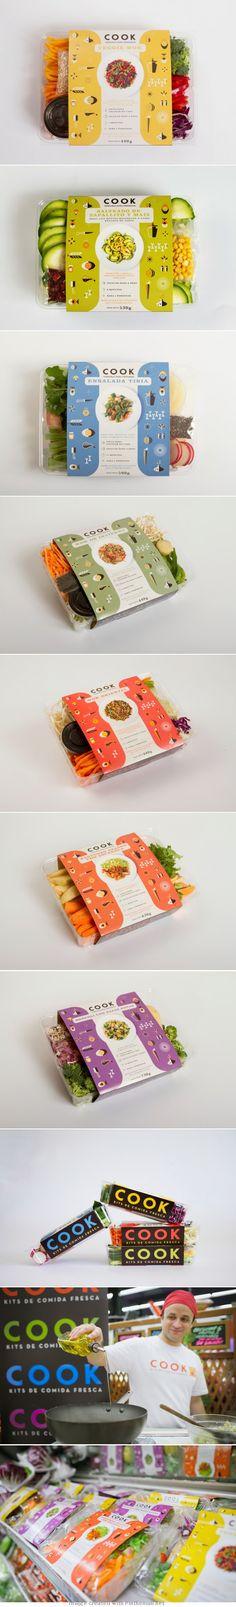 COOK Agency: Mundial Designer: Francisco Cunha y Martín Azambuja Client: Cook Country: Uruguay #Packaging